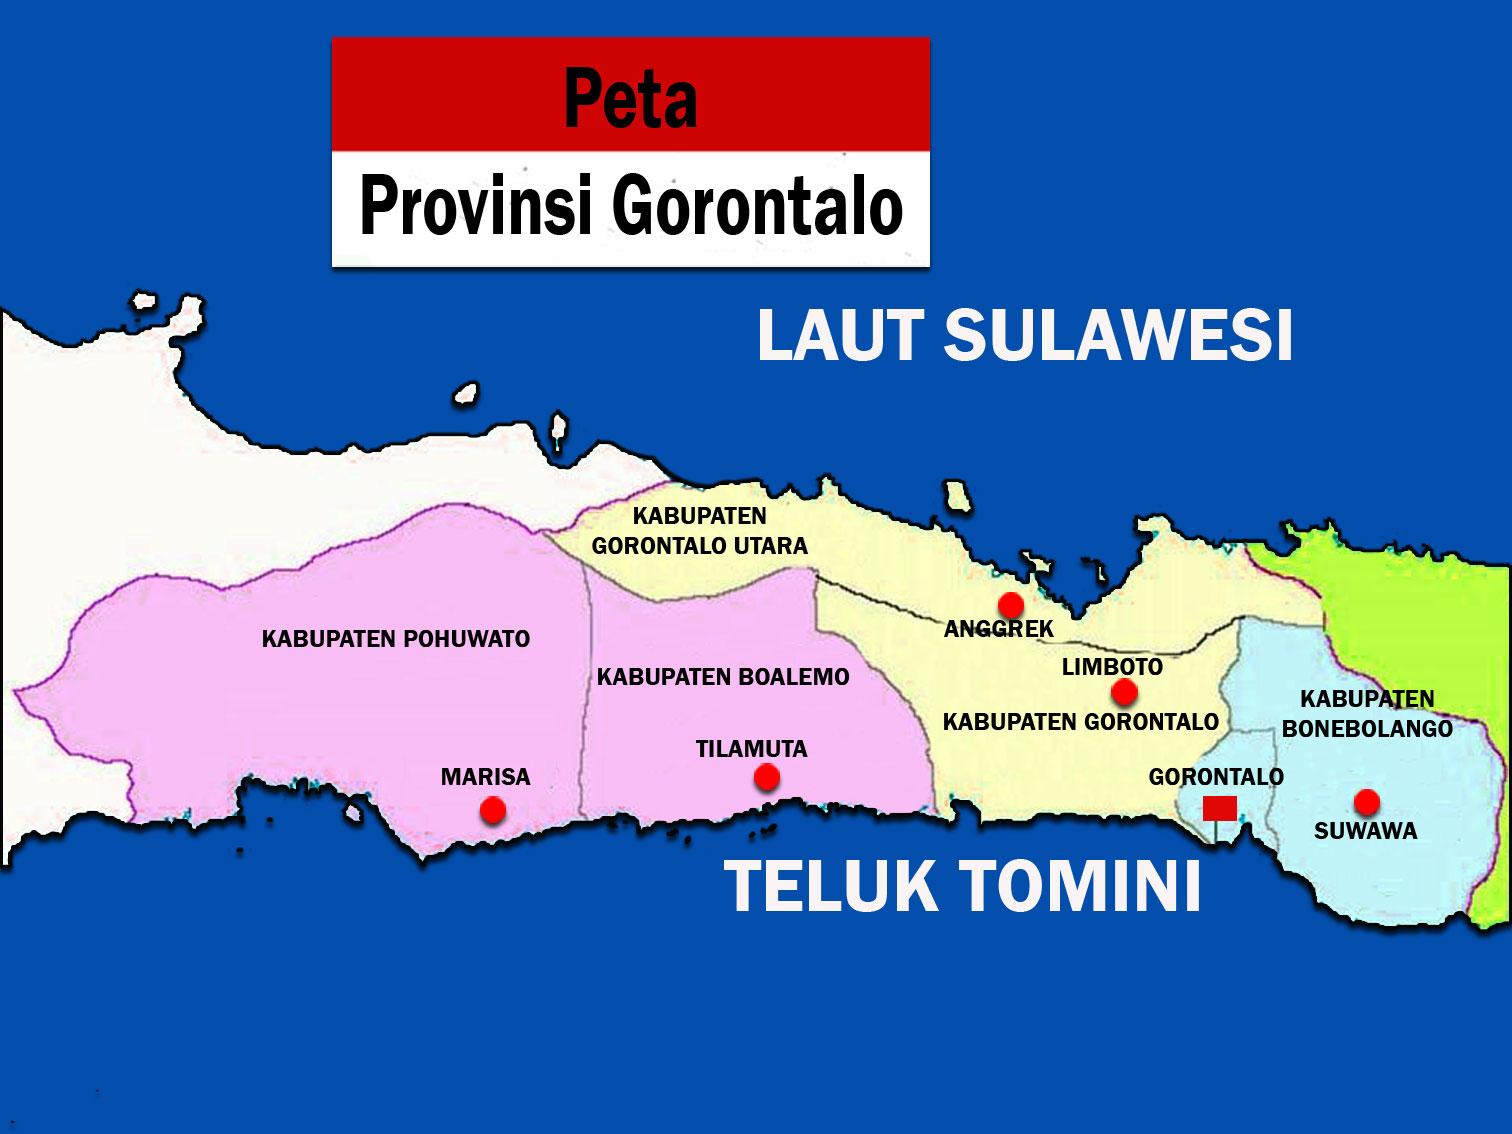 Provinsi Gorontalo Teluk Tomini Kab